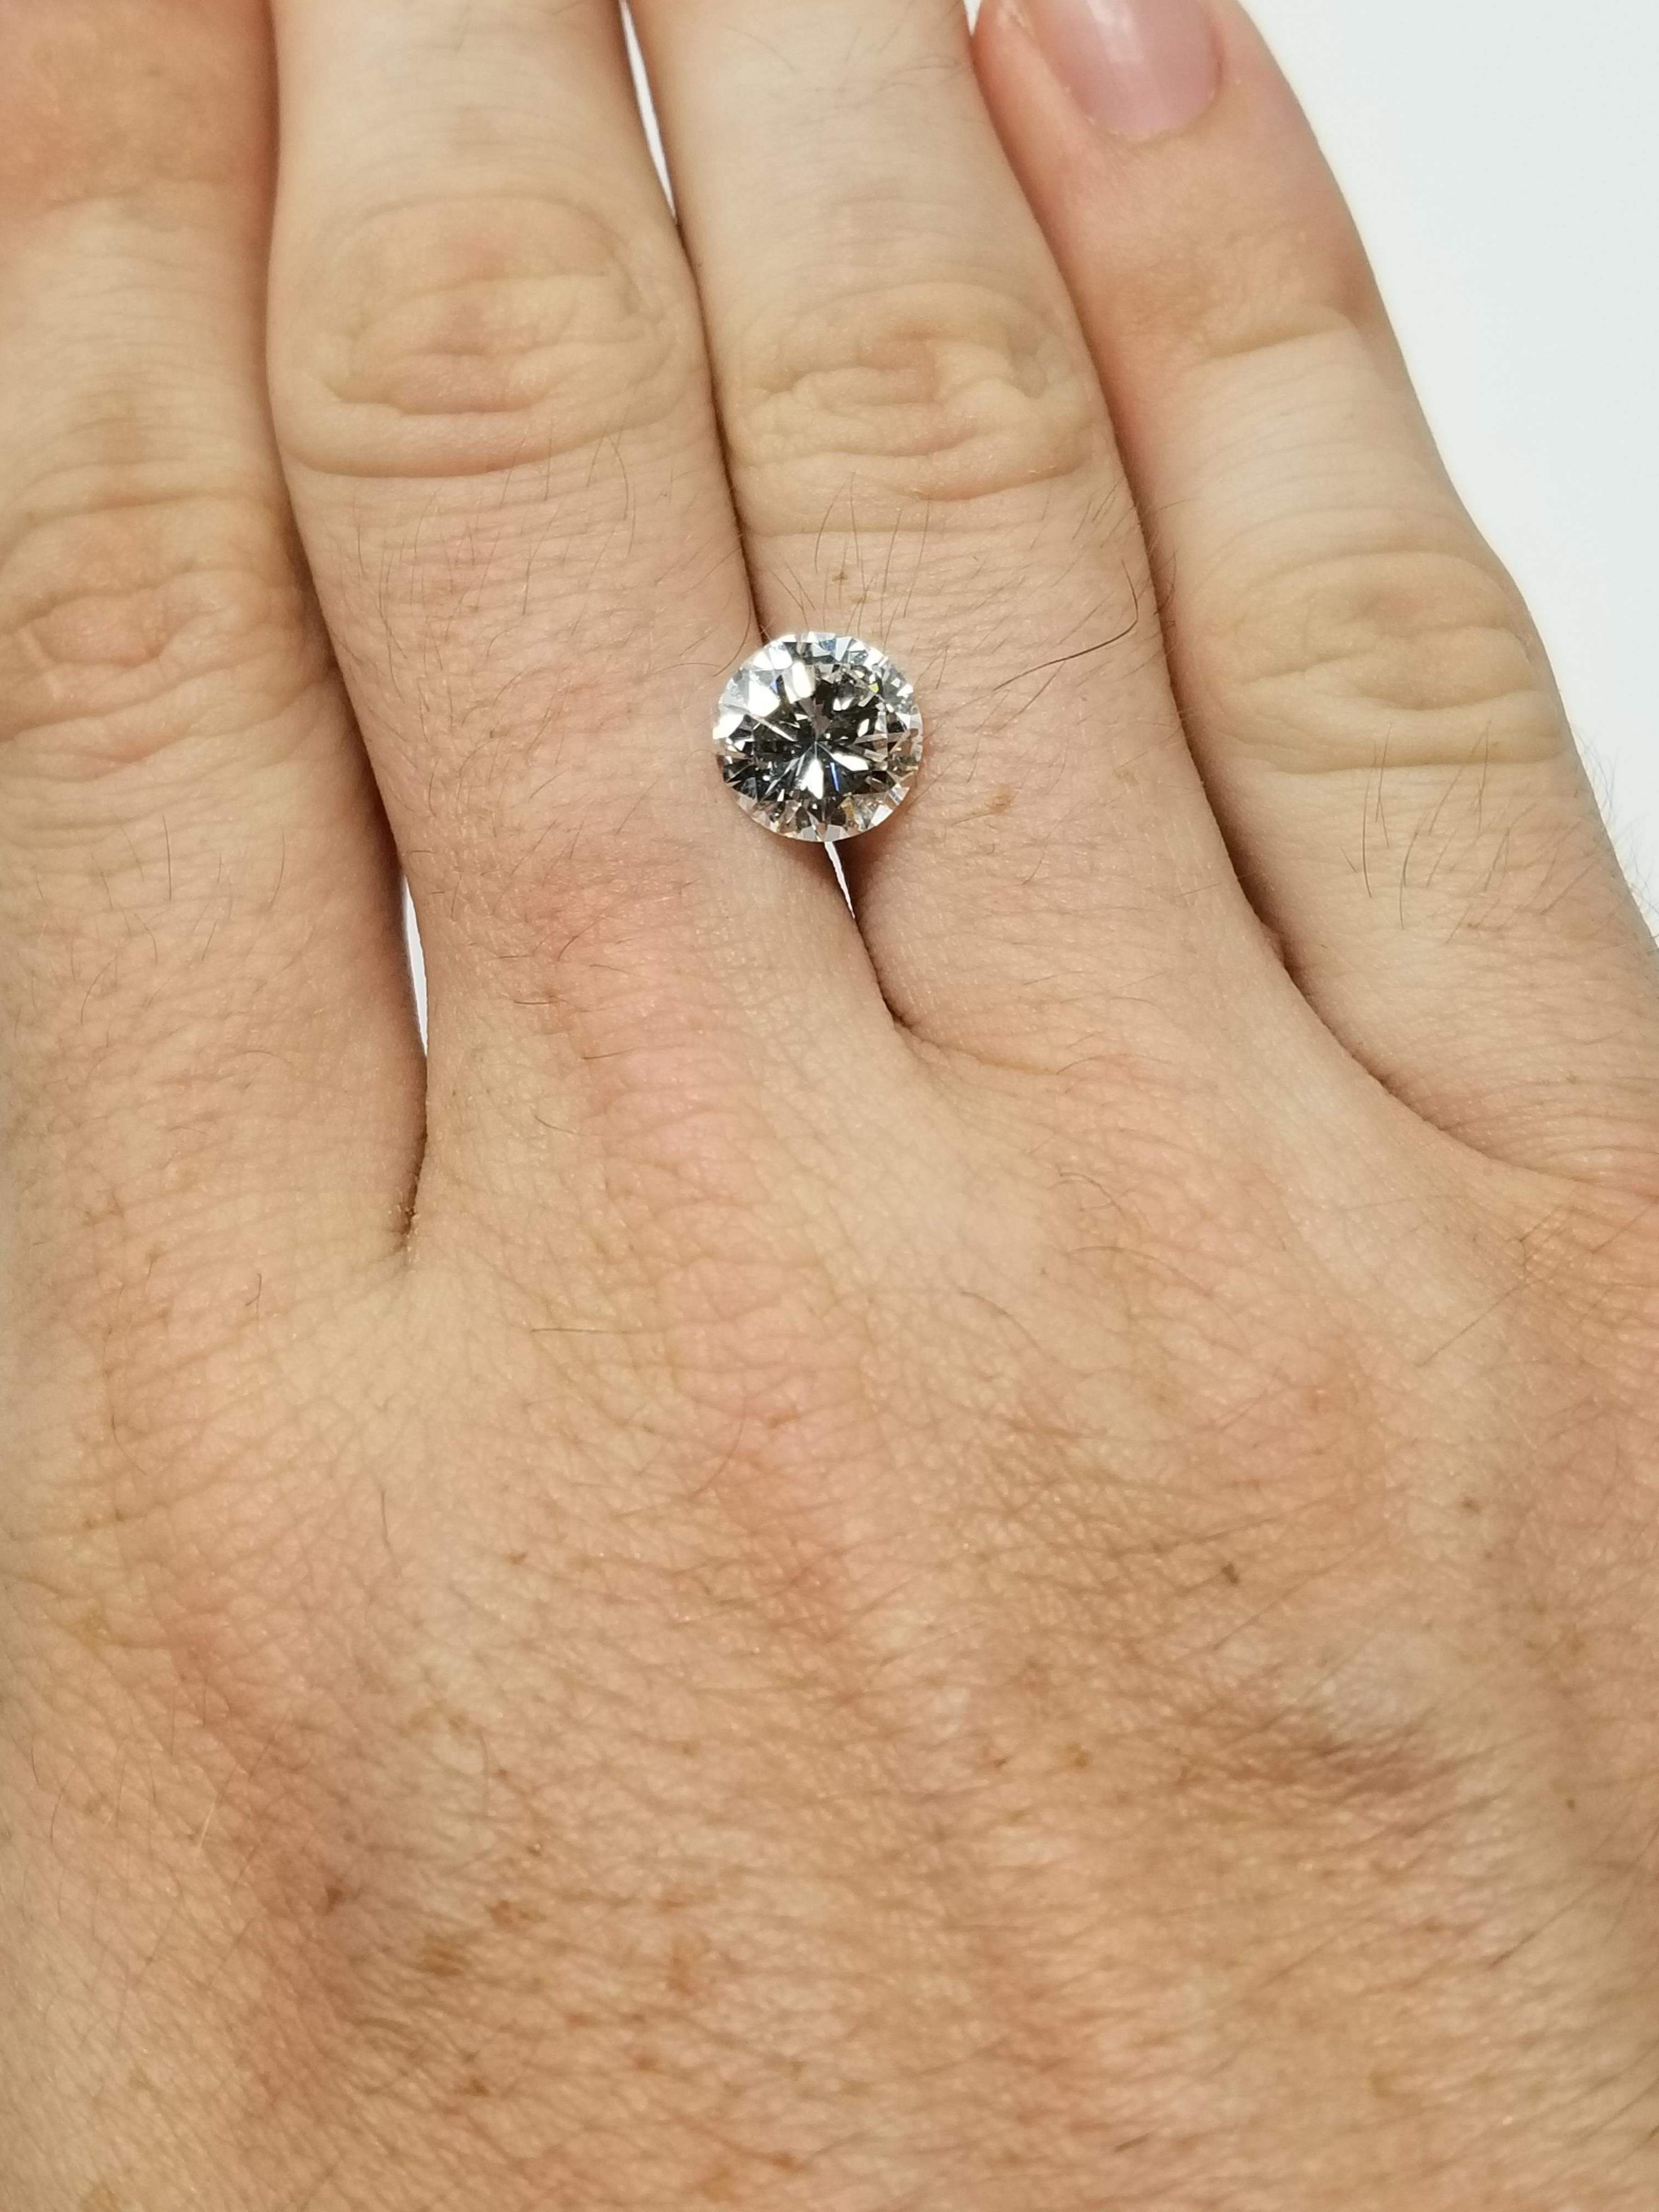 Lot 33 - GIA Certified 3.61ct Round Brilliant Diamond